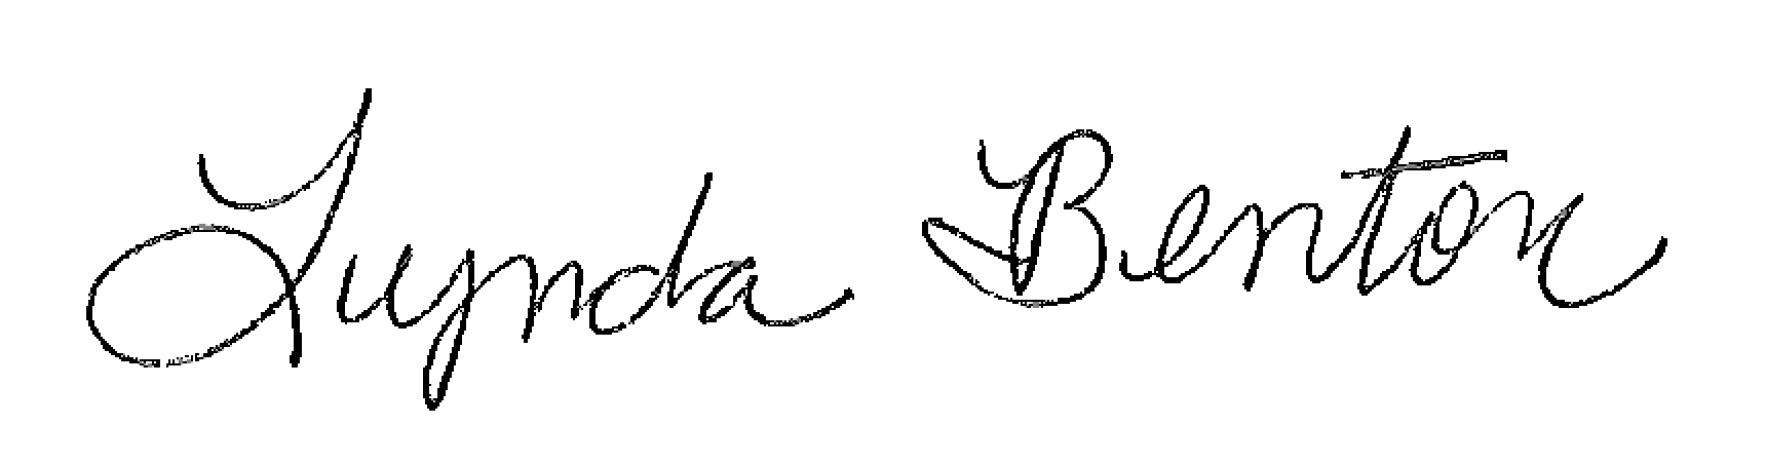 Lynda Benton signature